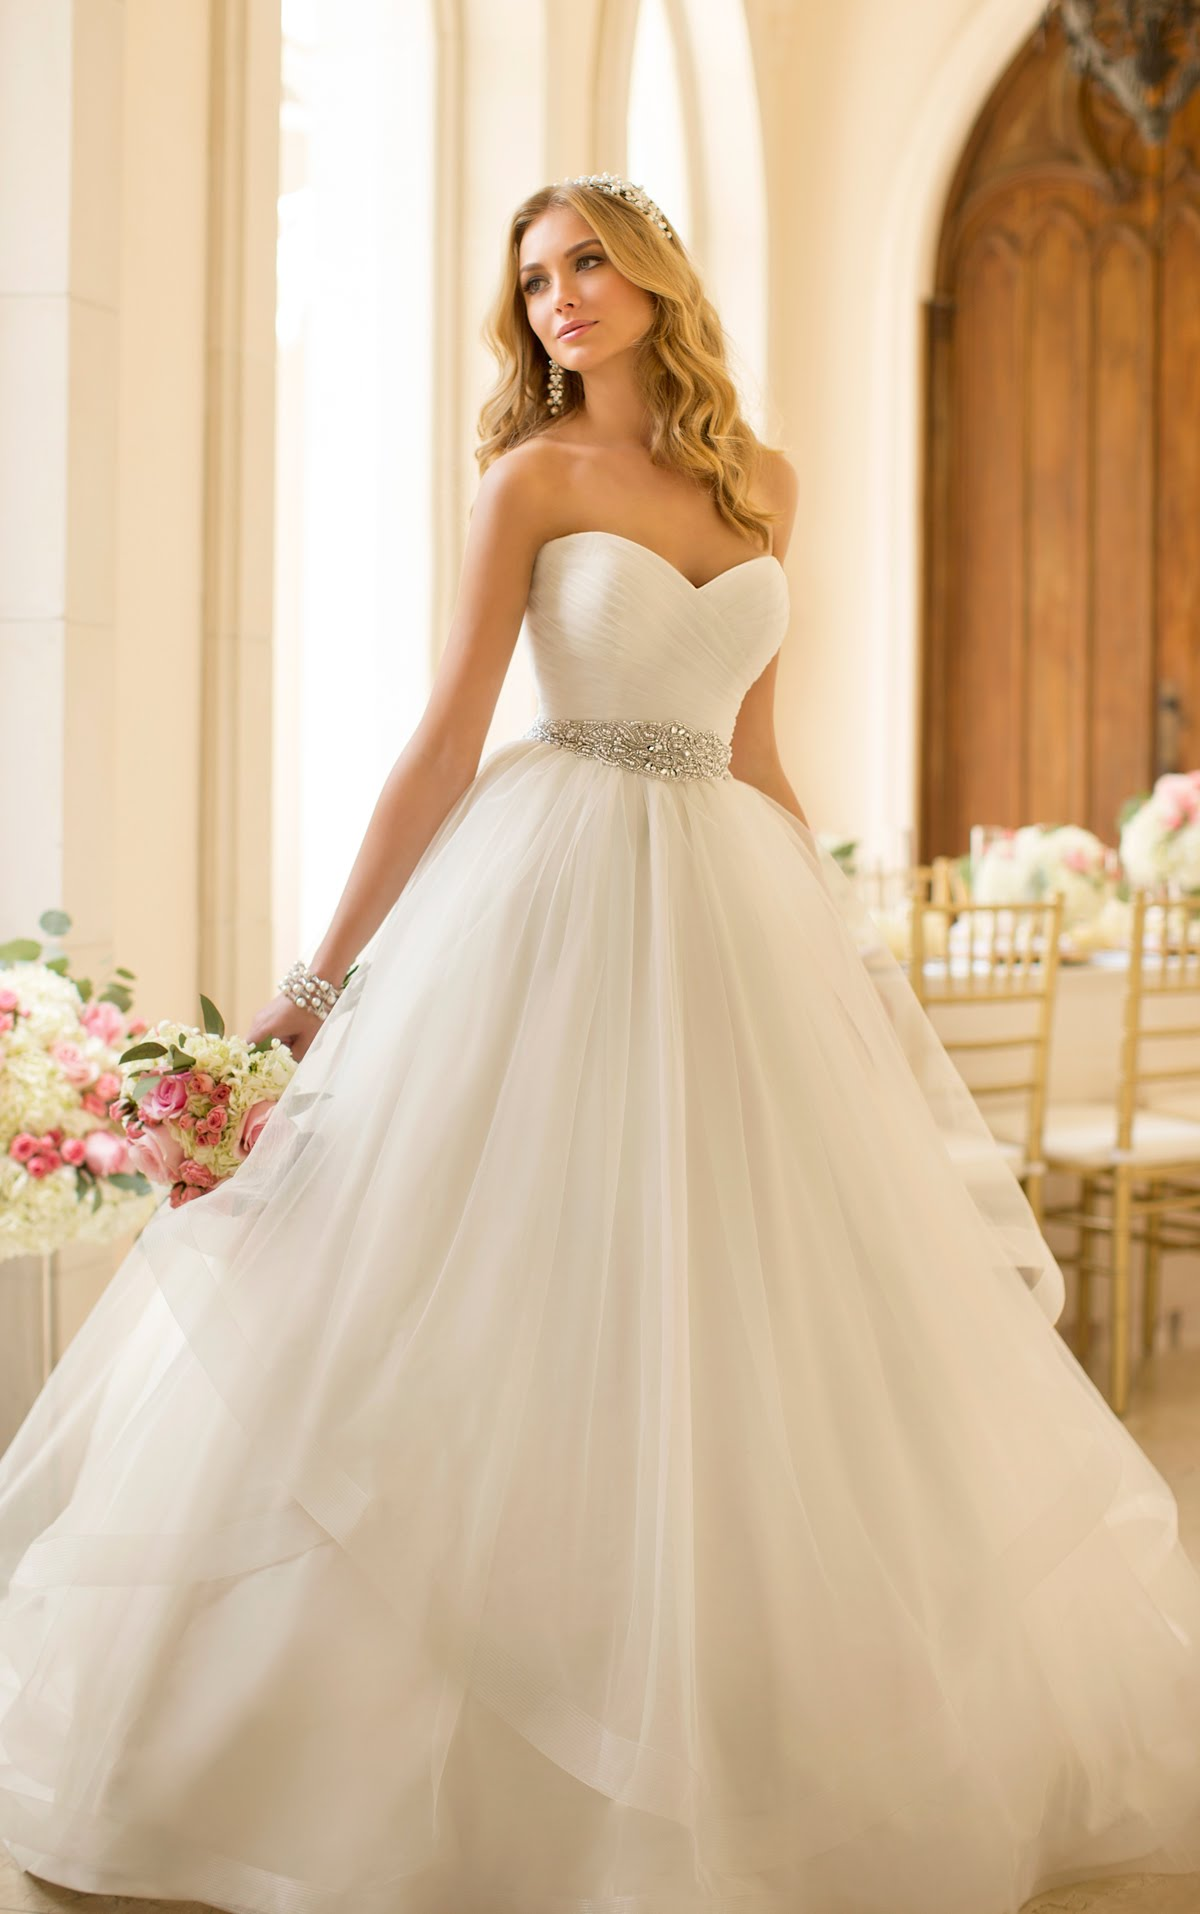 بالصور تصميمات فساتين زفاف 2019 , احدث وارق موديلات فستان الزواج 484 3